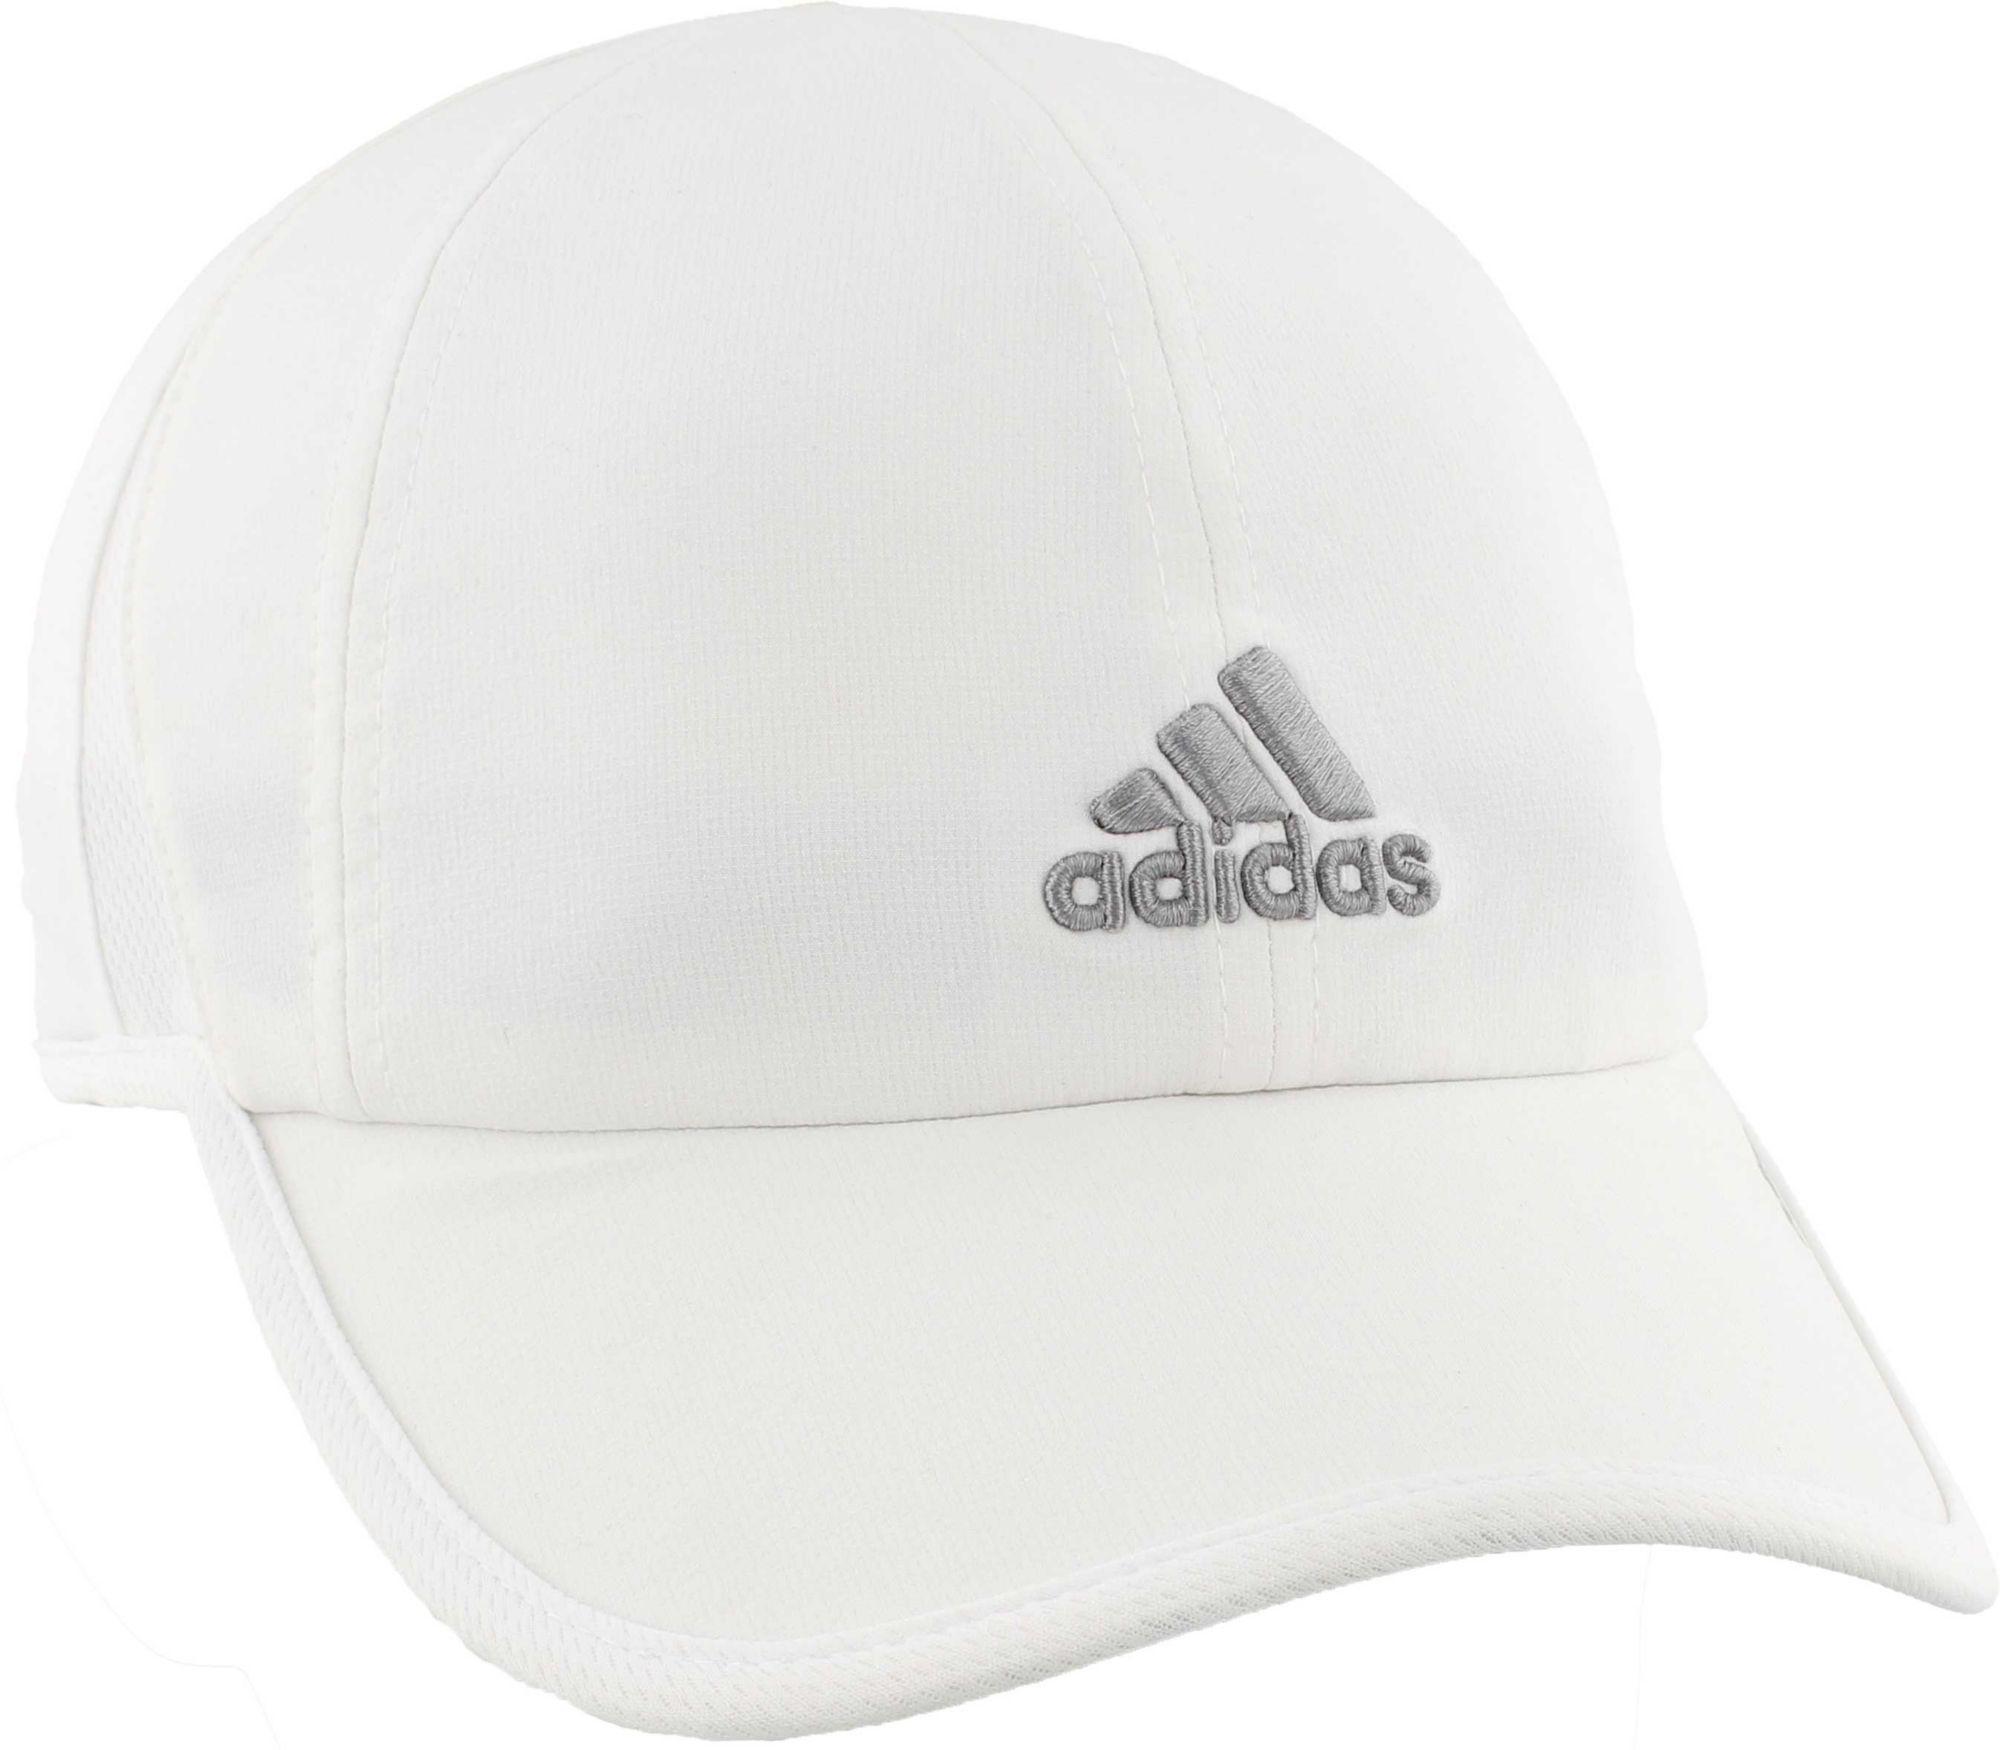 Adidas - White Adizero Ii Hat - Lyst. View fullscreen 9d91a4705bf